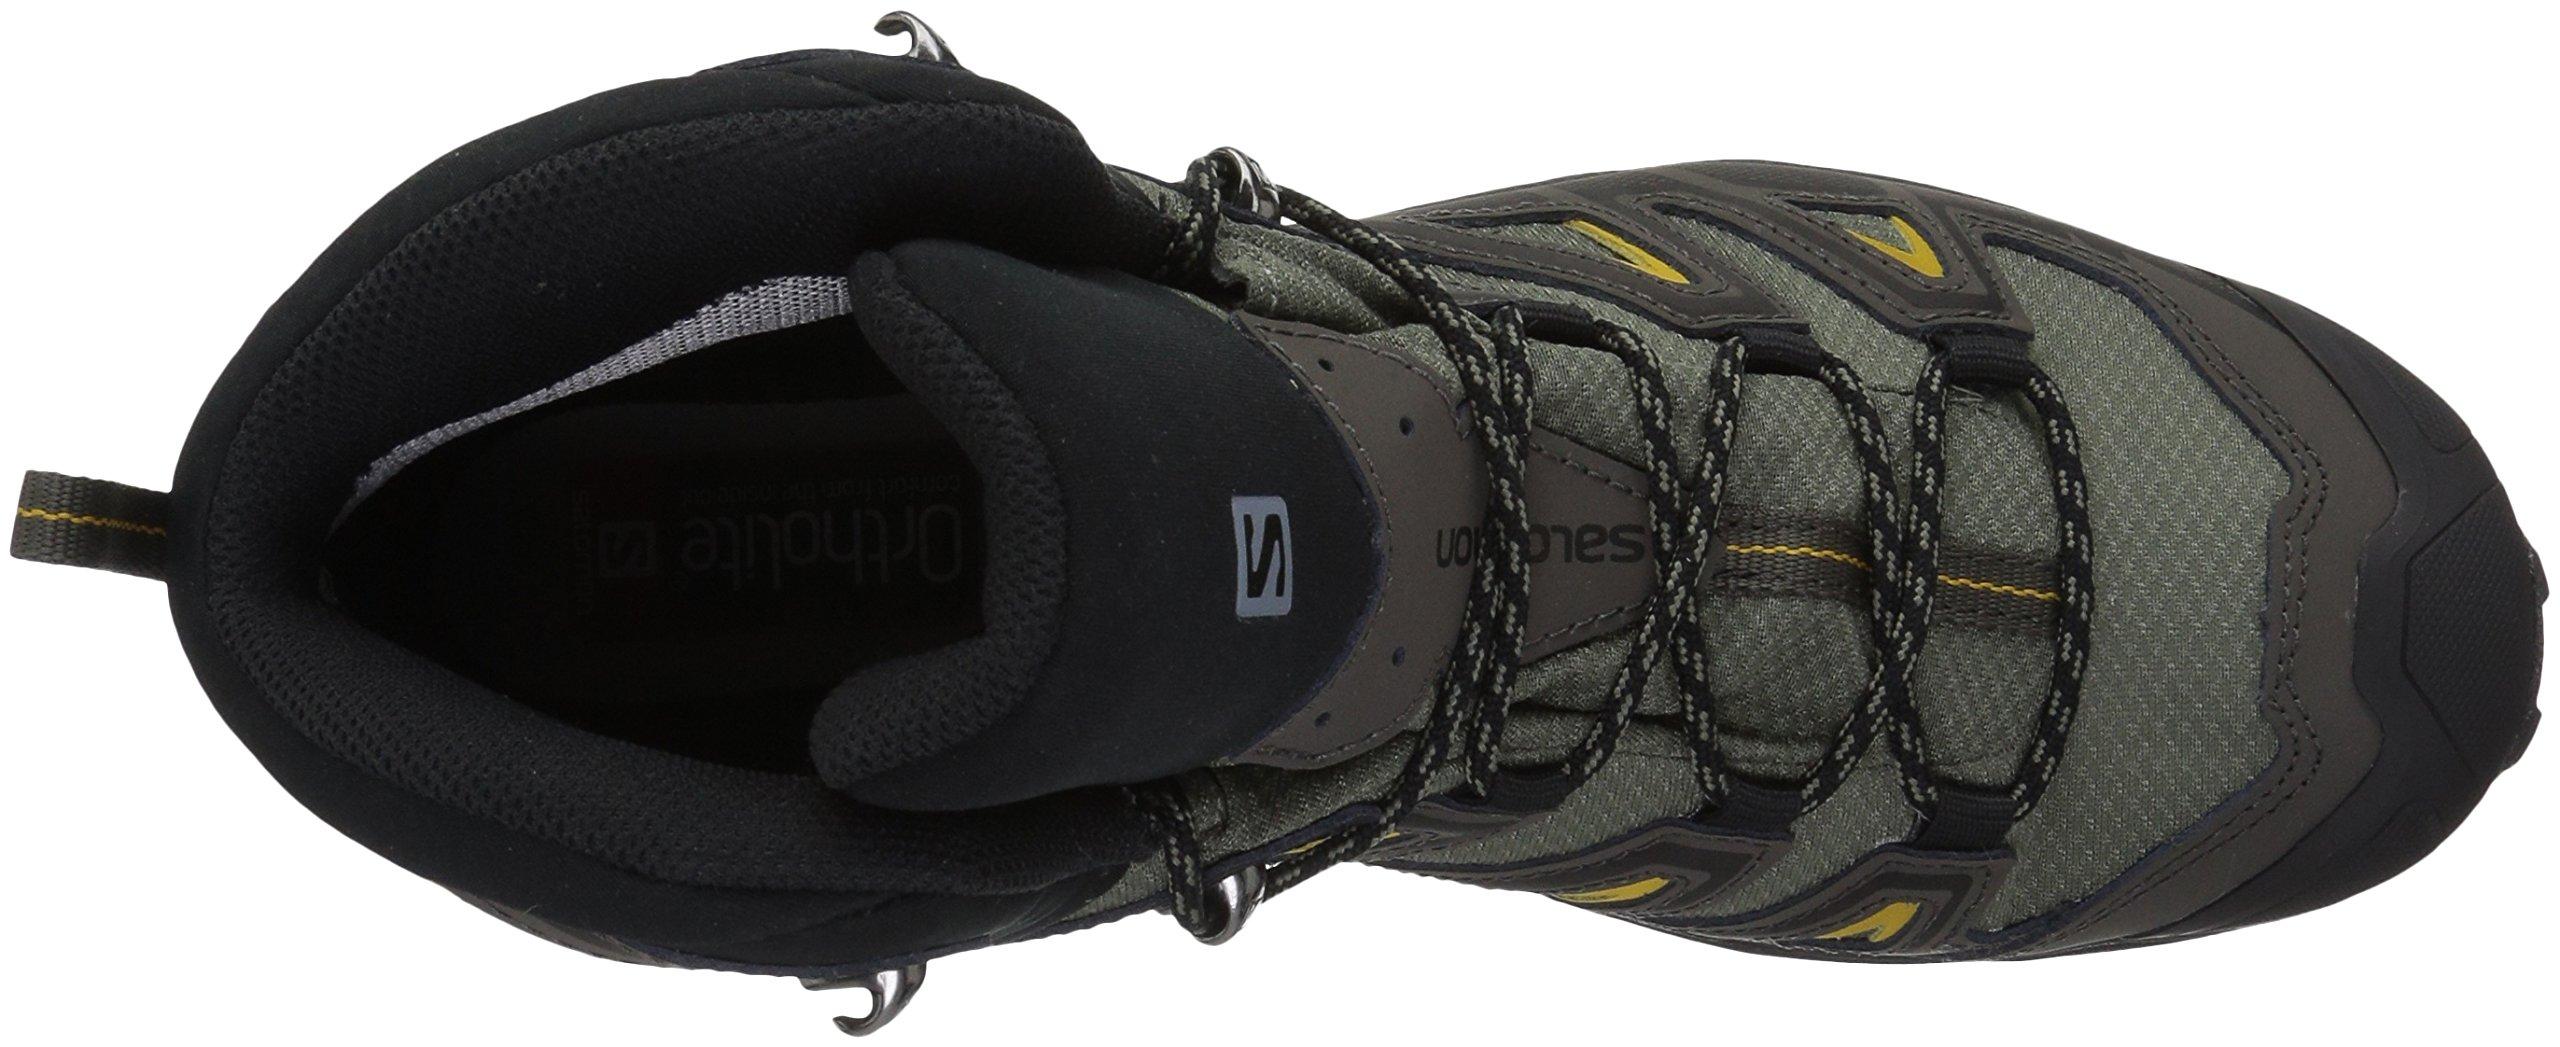 e69fbfc7829 Salomon Men's X Ultra 3 Mid GTX Hiking Boot, Castor Gray, 11 M US ...